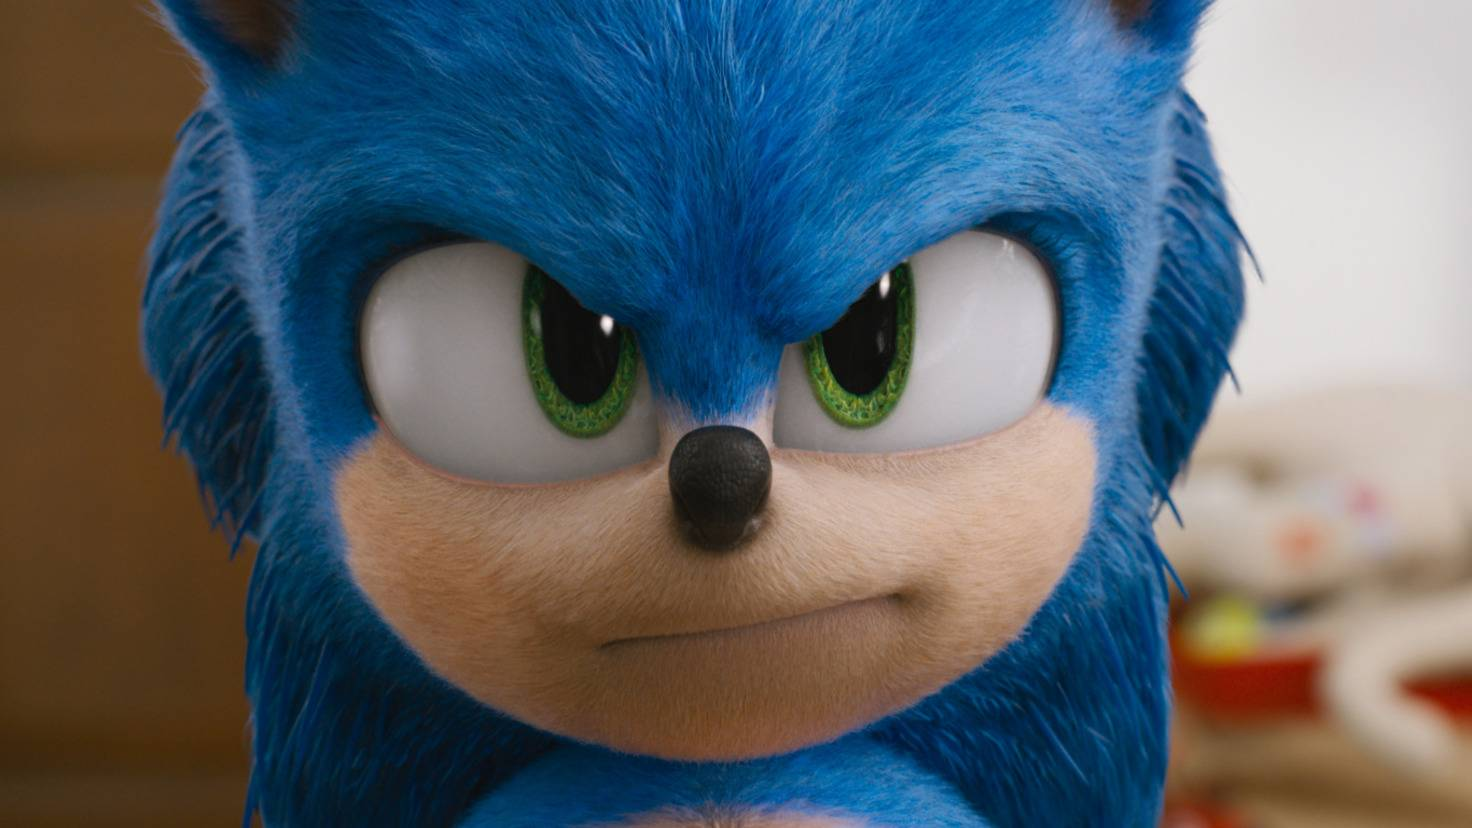 sonic-the-hedgehog-1